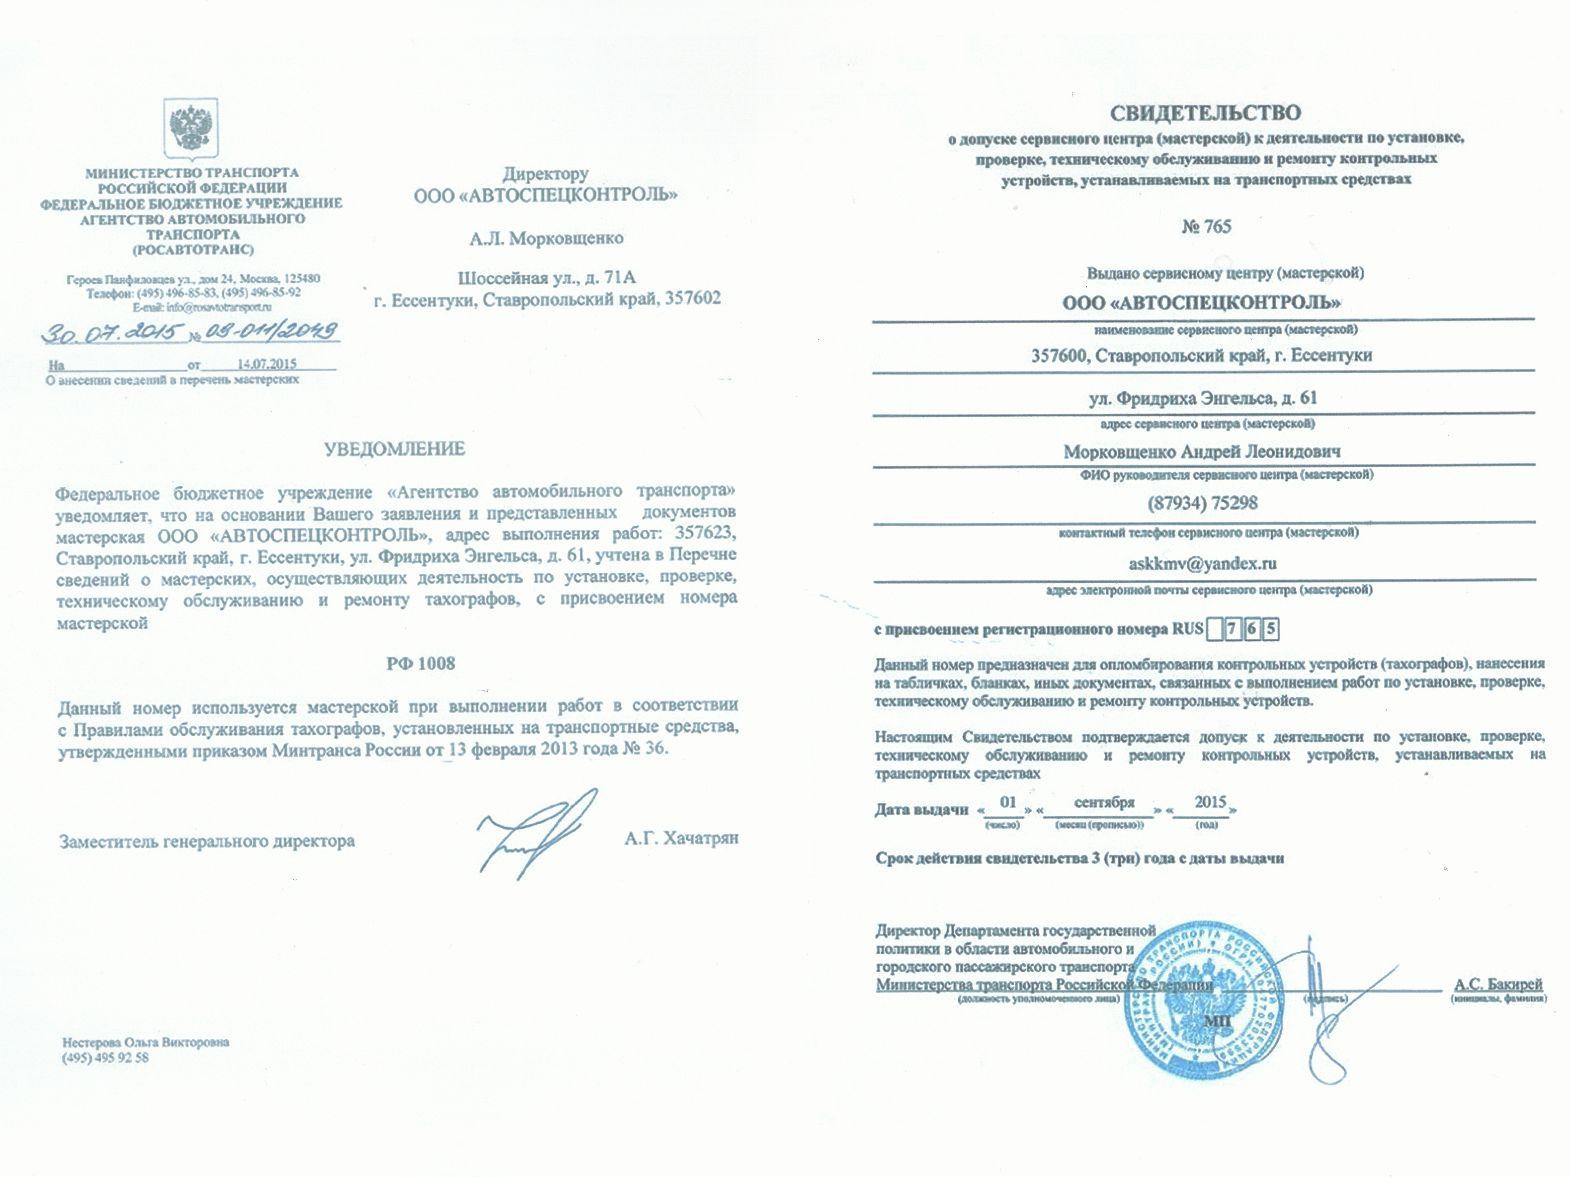 РФ 1008, RUS 765